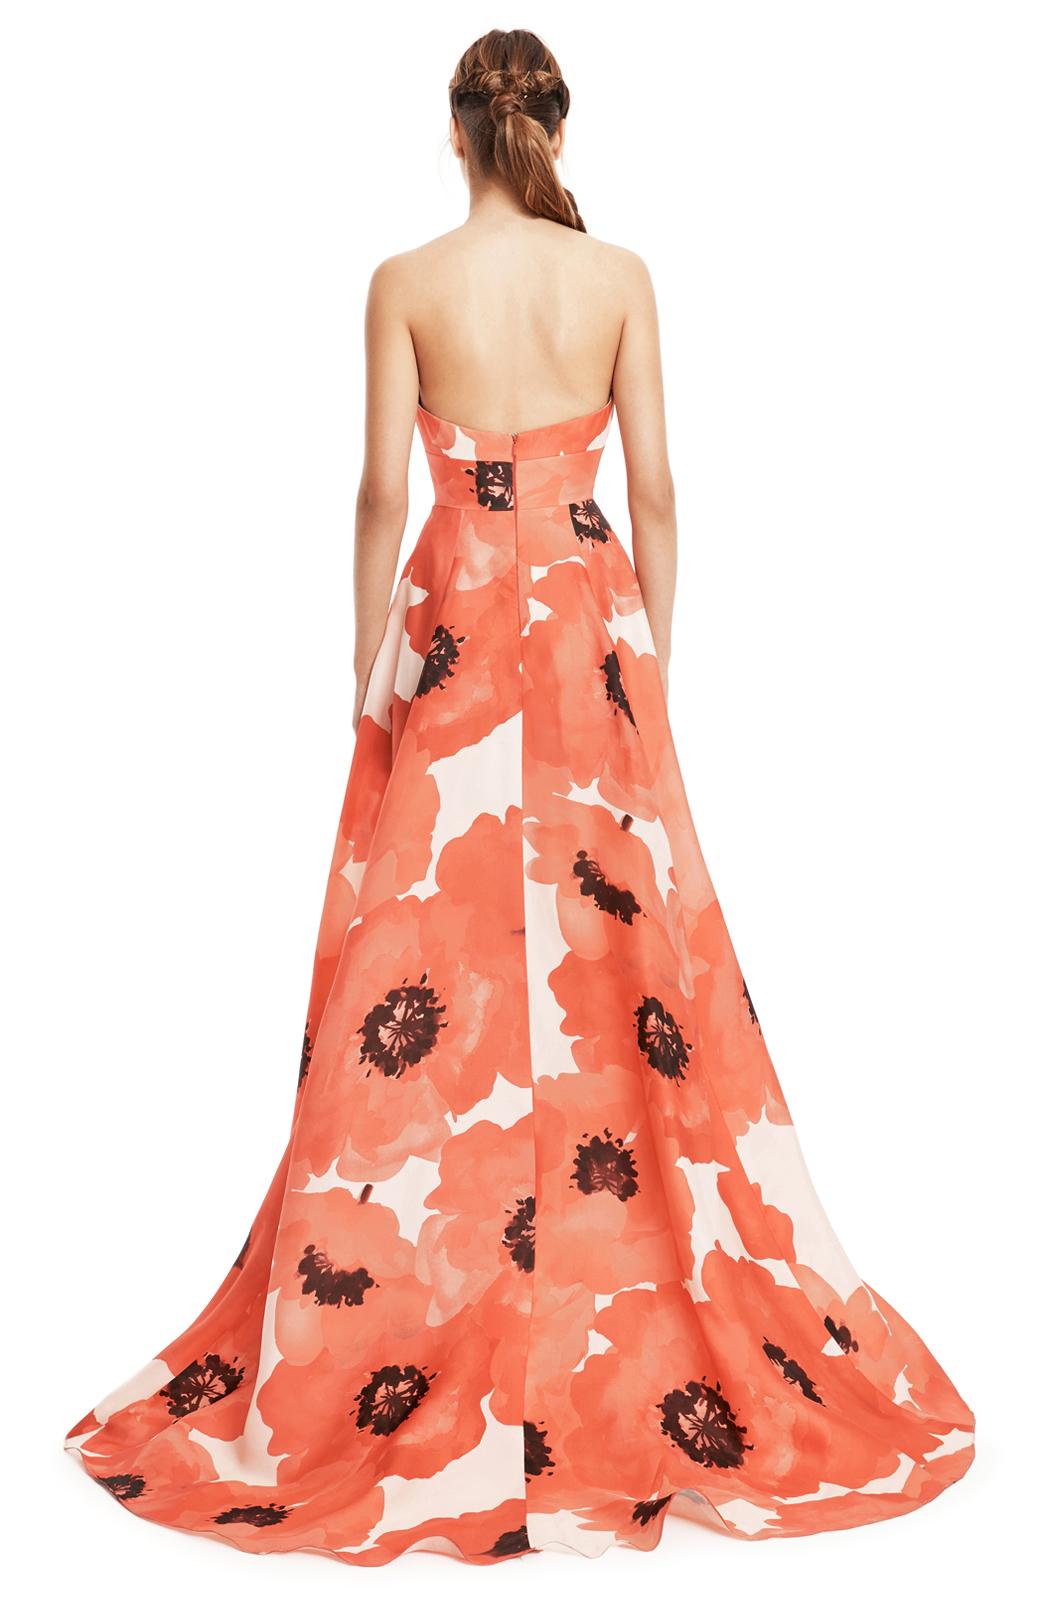 Lela Rose Silk Sleeveless Dress Clearance Footlocker Get To Buy For Sale G56jh